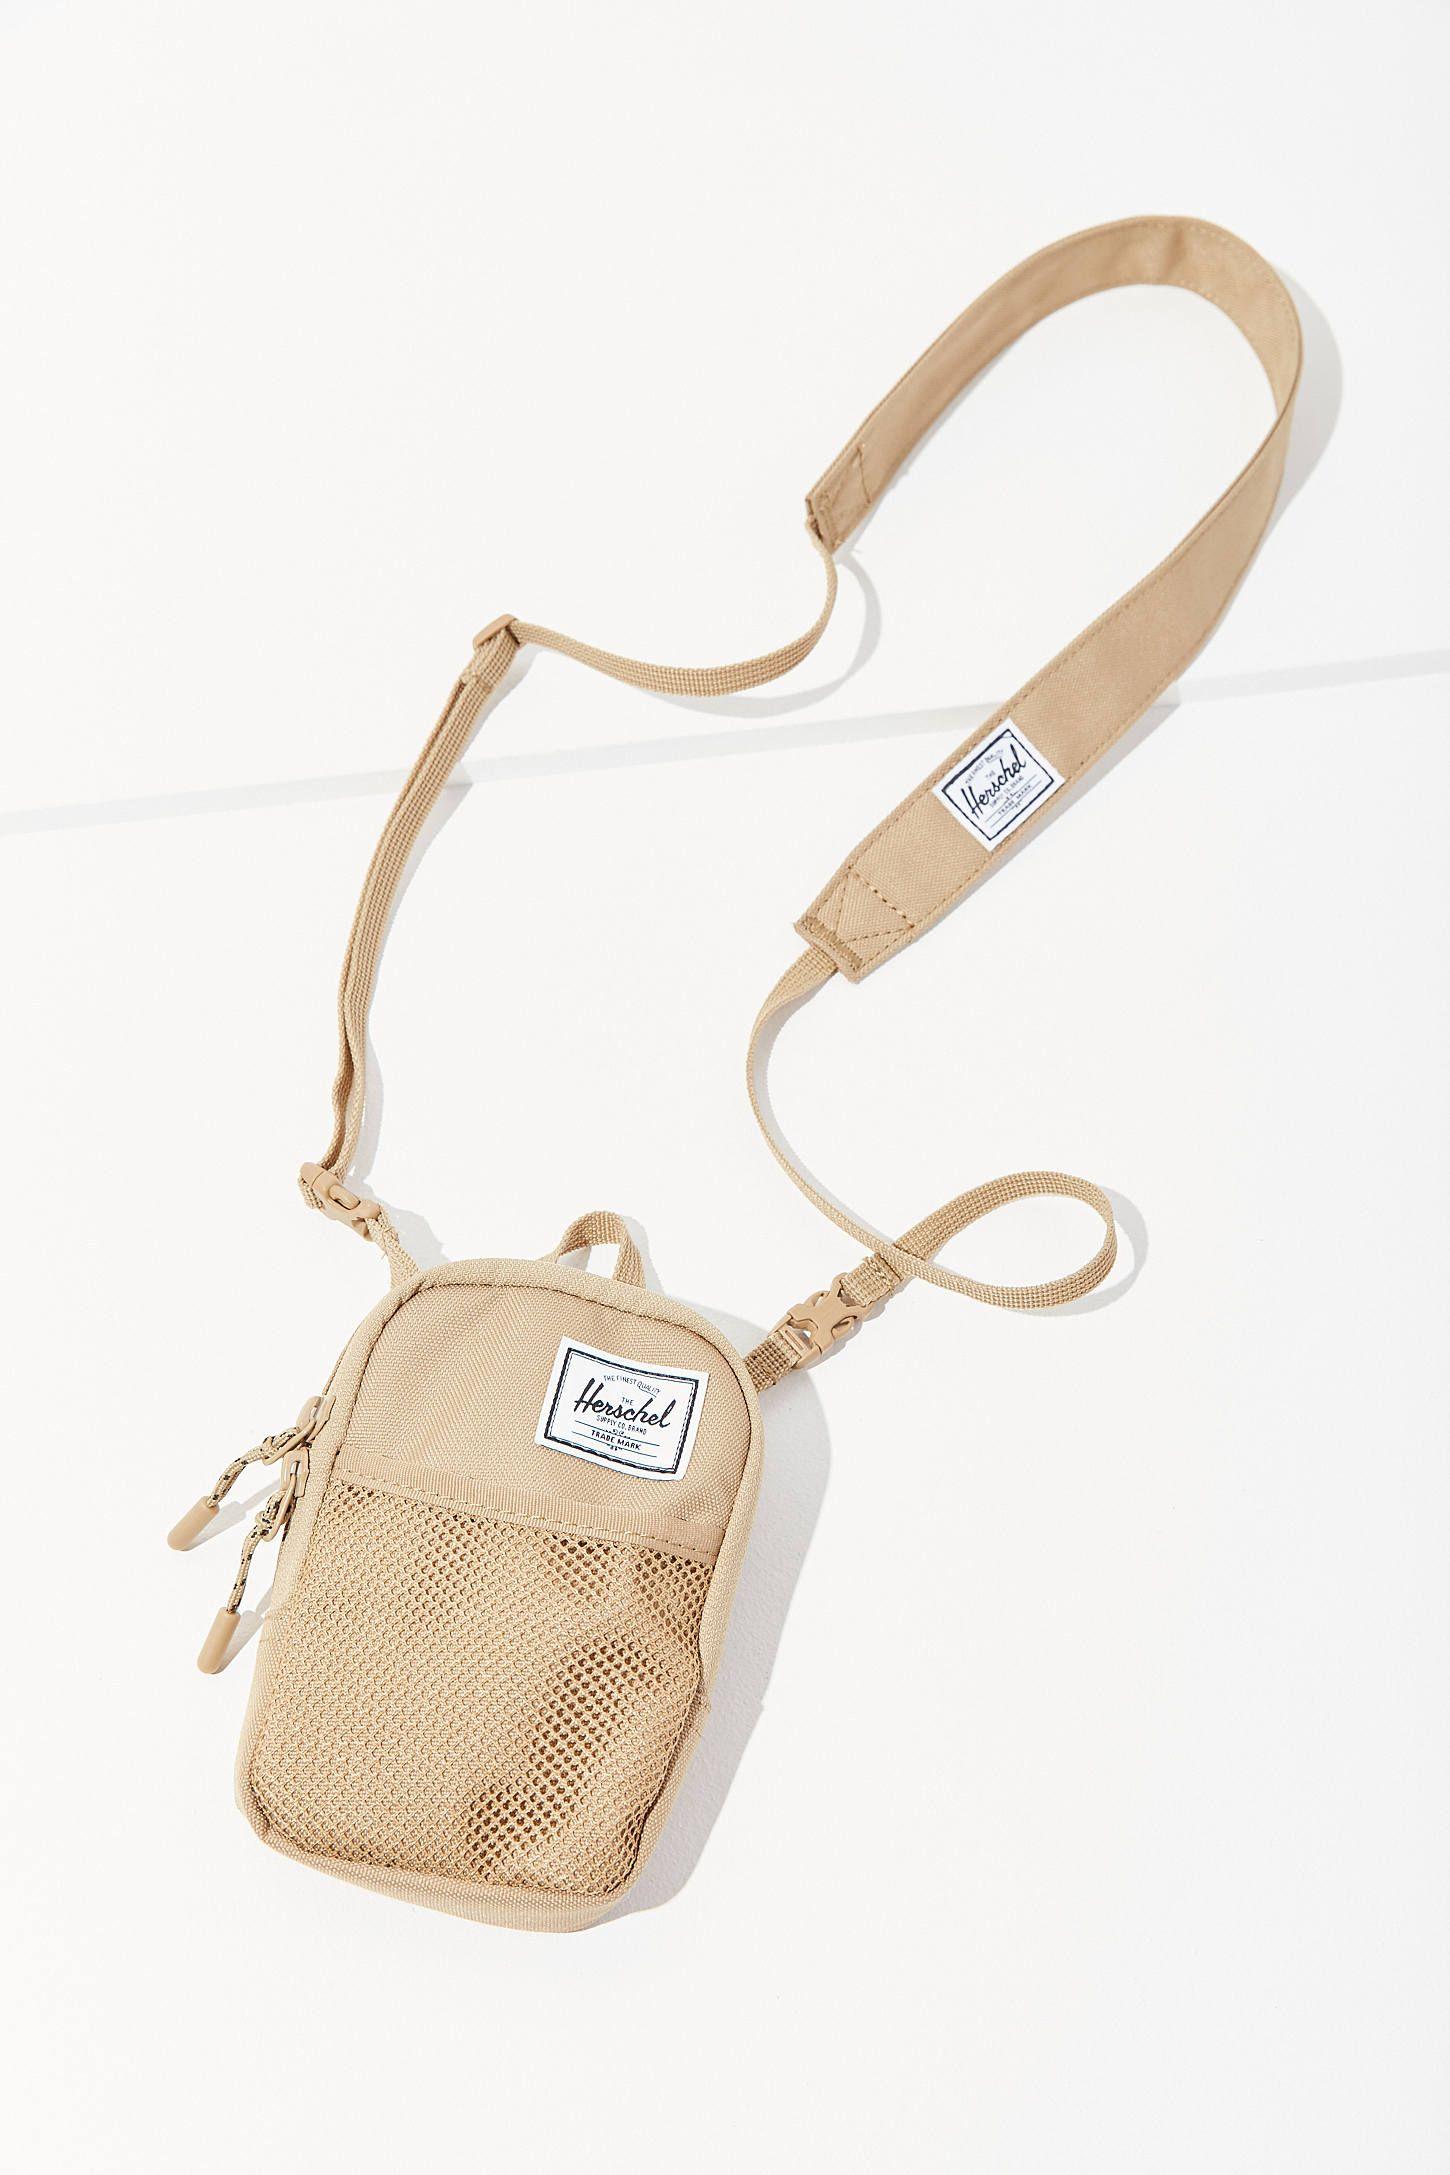 b53cf1d6713 Herschel Supply Co. Sinclair Small Crossbody Bag in 2019